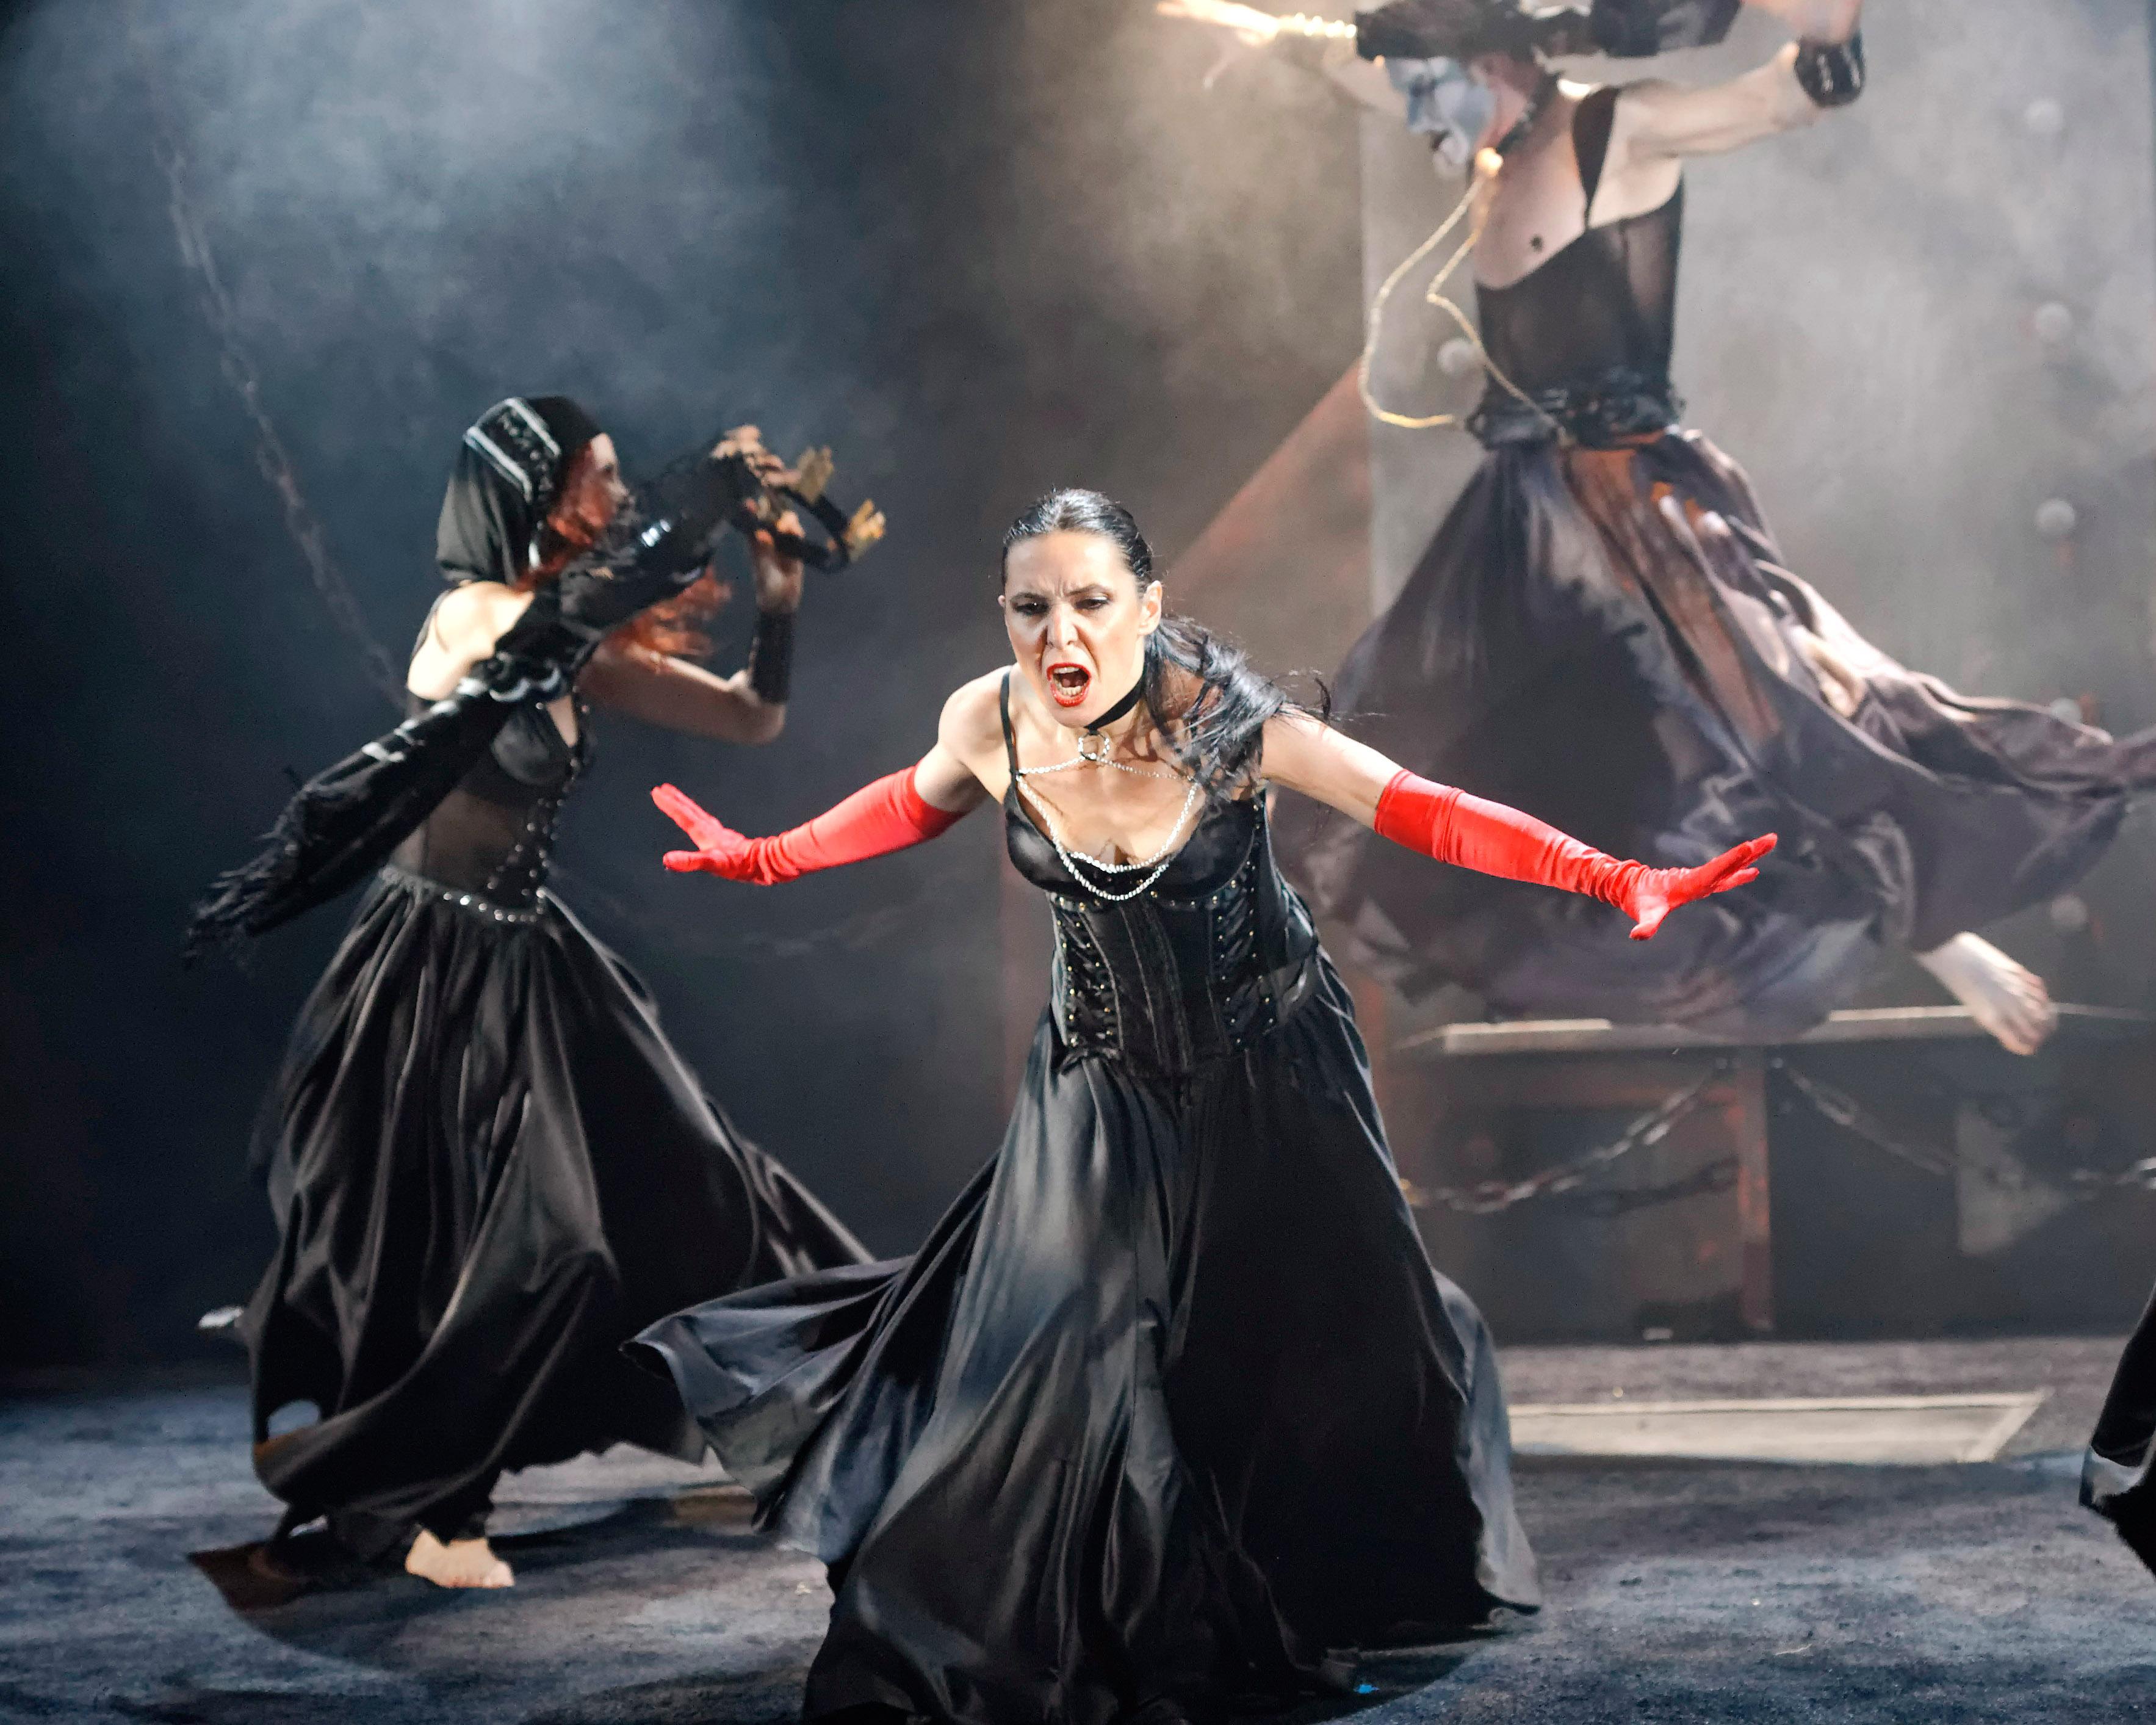 Irina Tsikurishvili, Mary Werntz and Philip Fletcher in Synetic Theater's 2011 production of Macbeth. Photo credit: Graeme B. Shaw